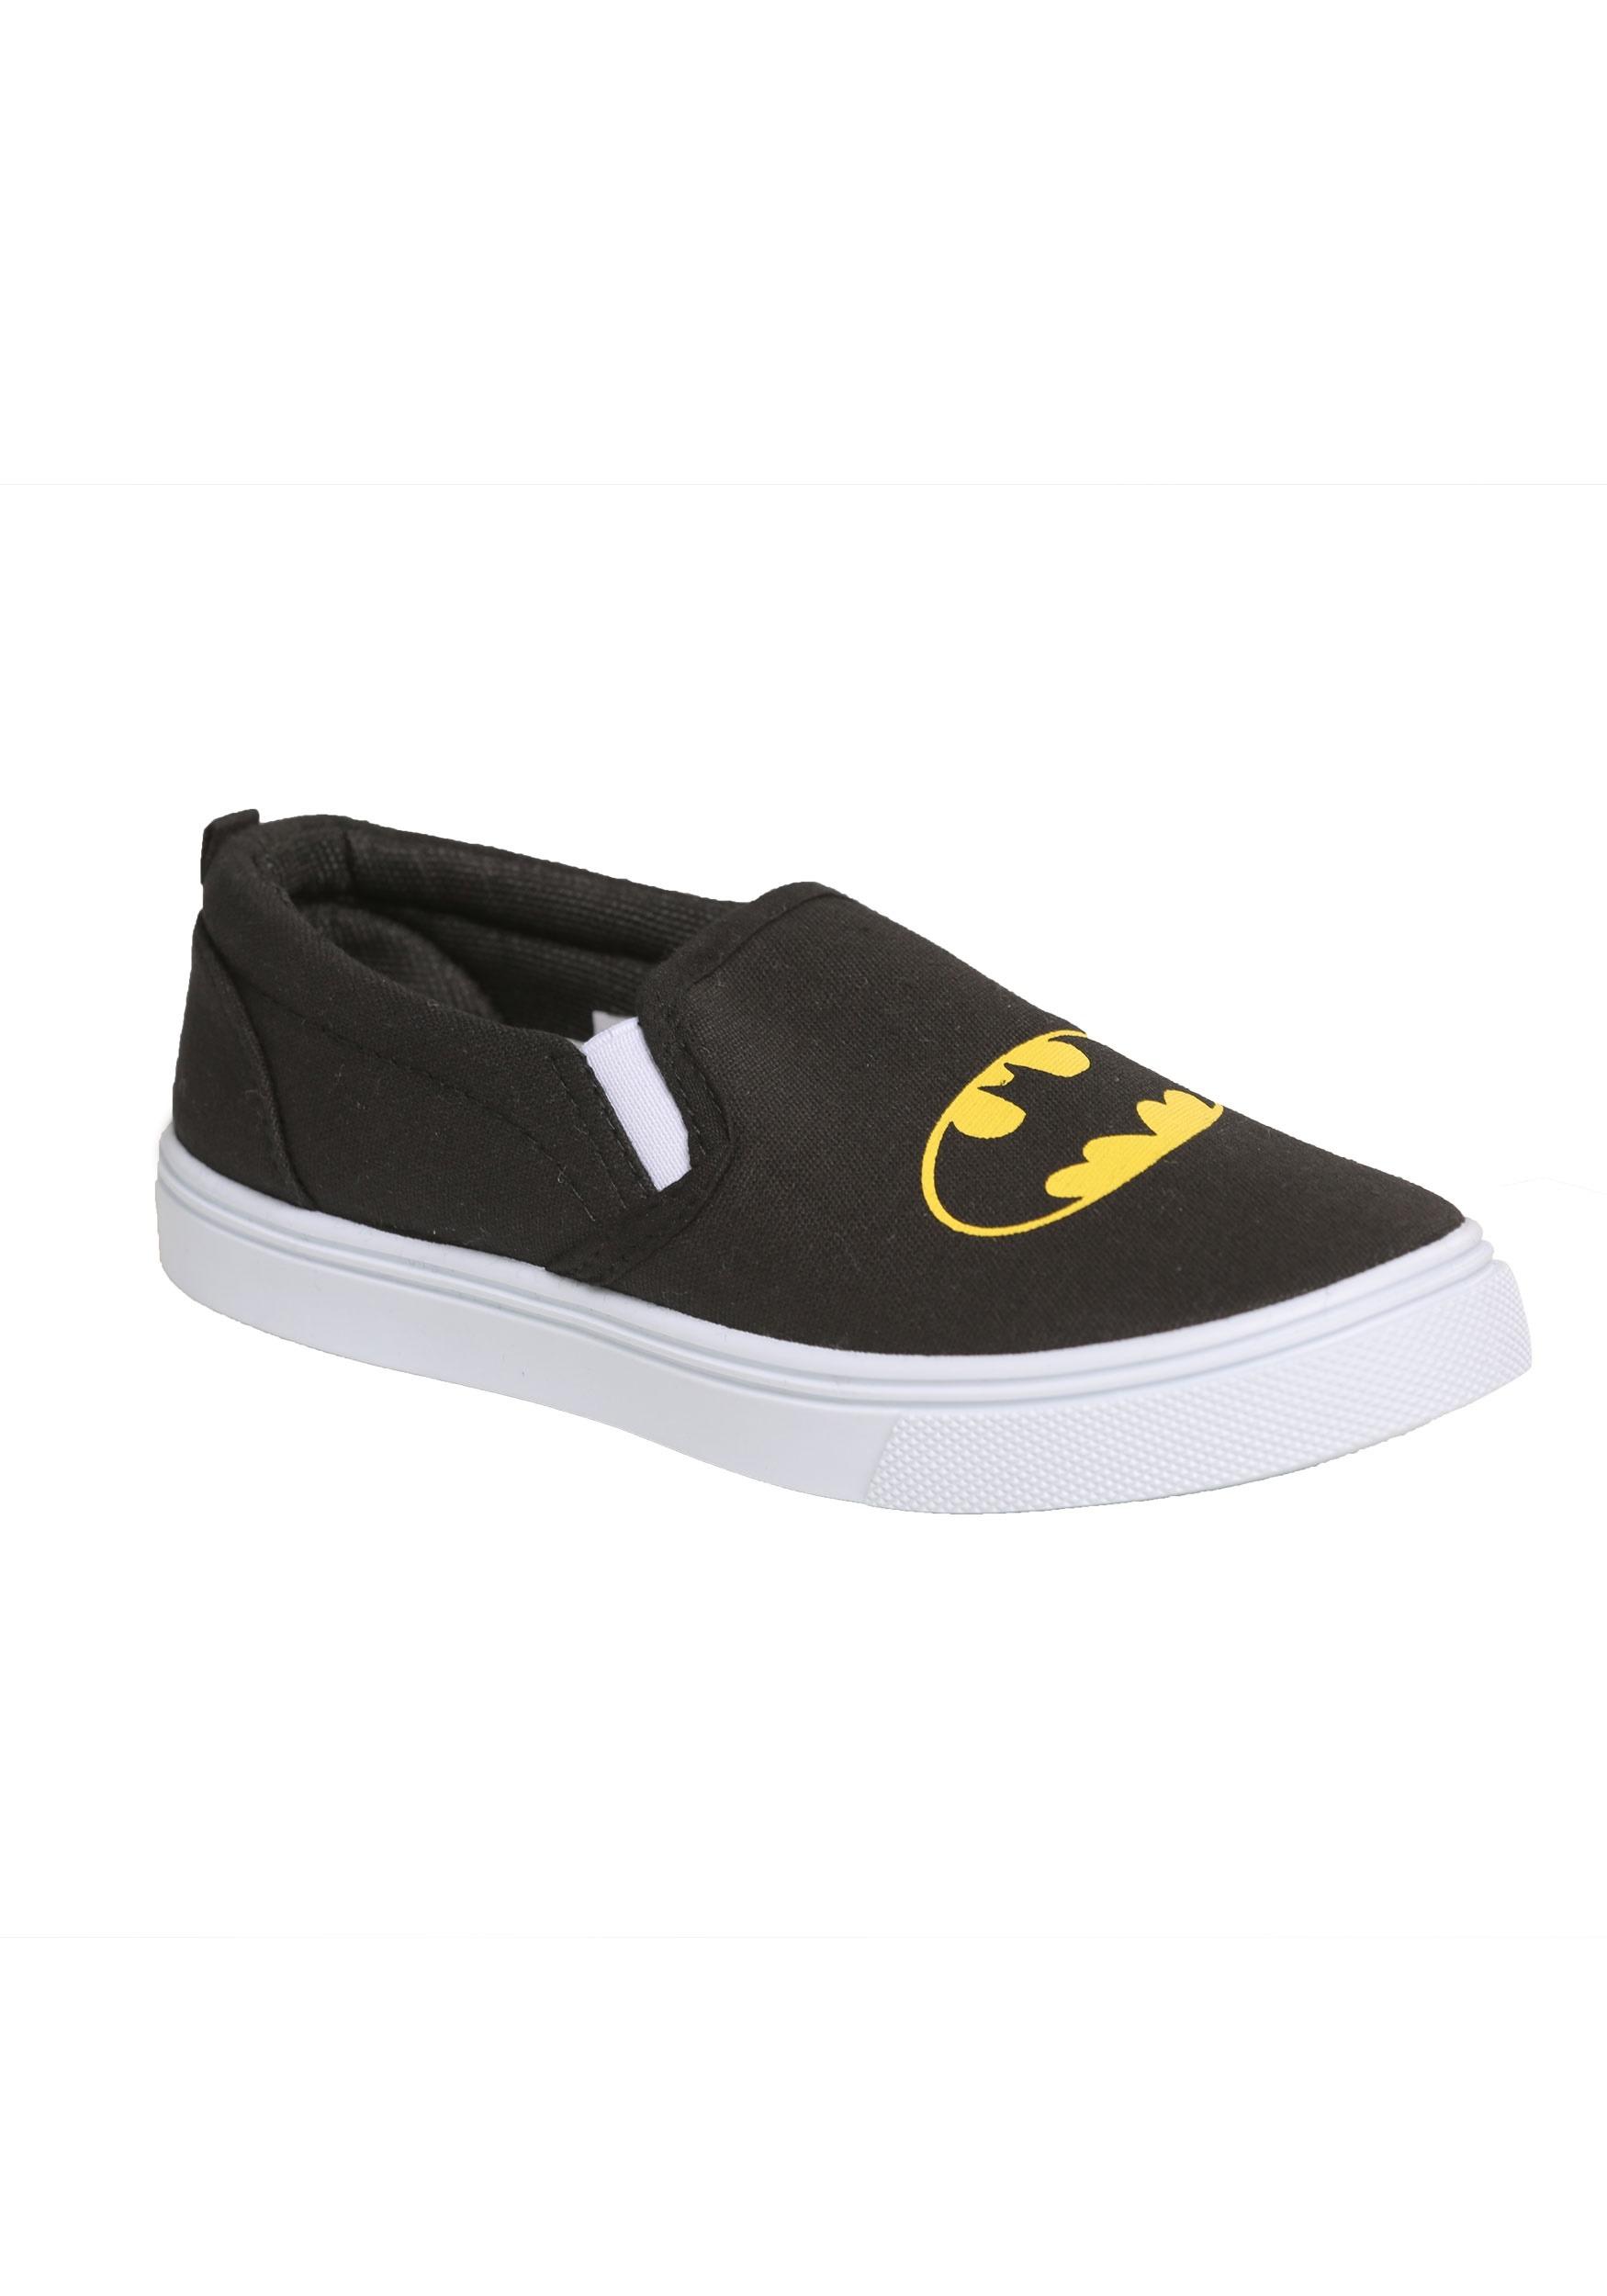 Batman Logo Kids Slip-On Canvas Shoes